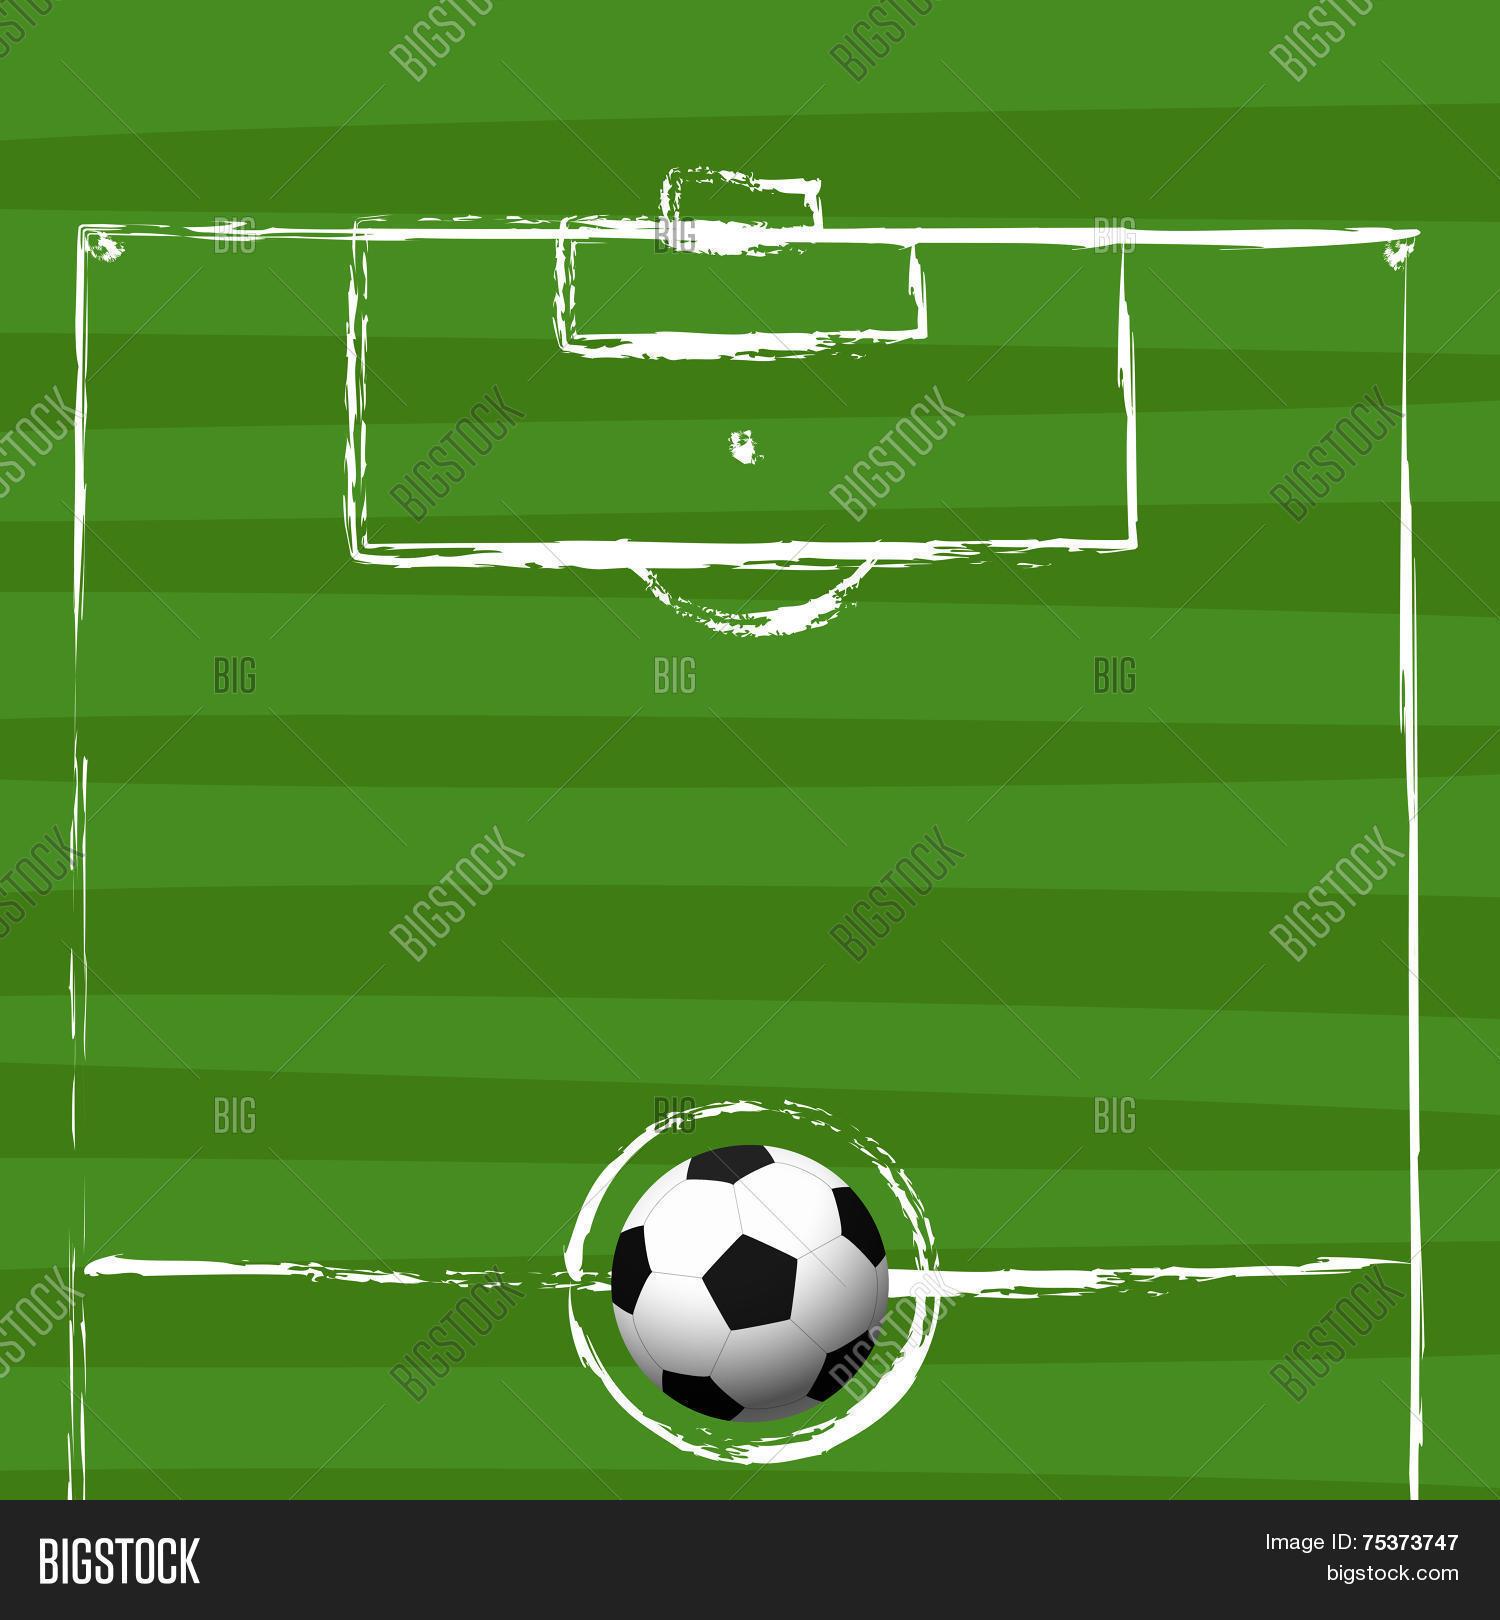 Football Field Grunge Vector Photo Free Trial Bigstock